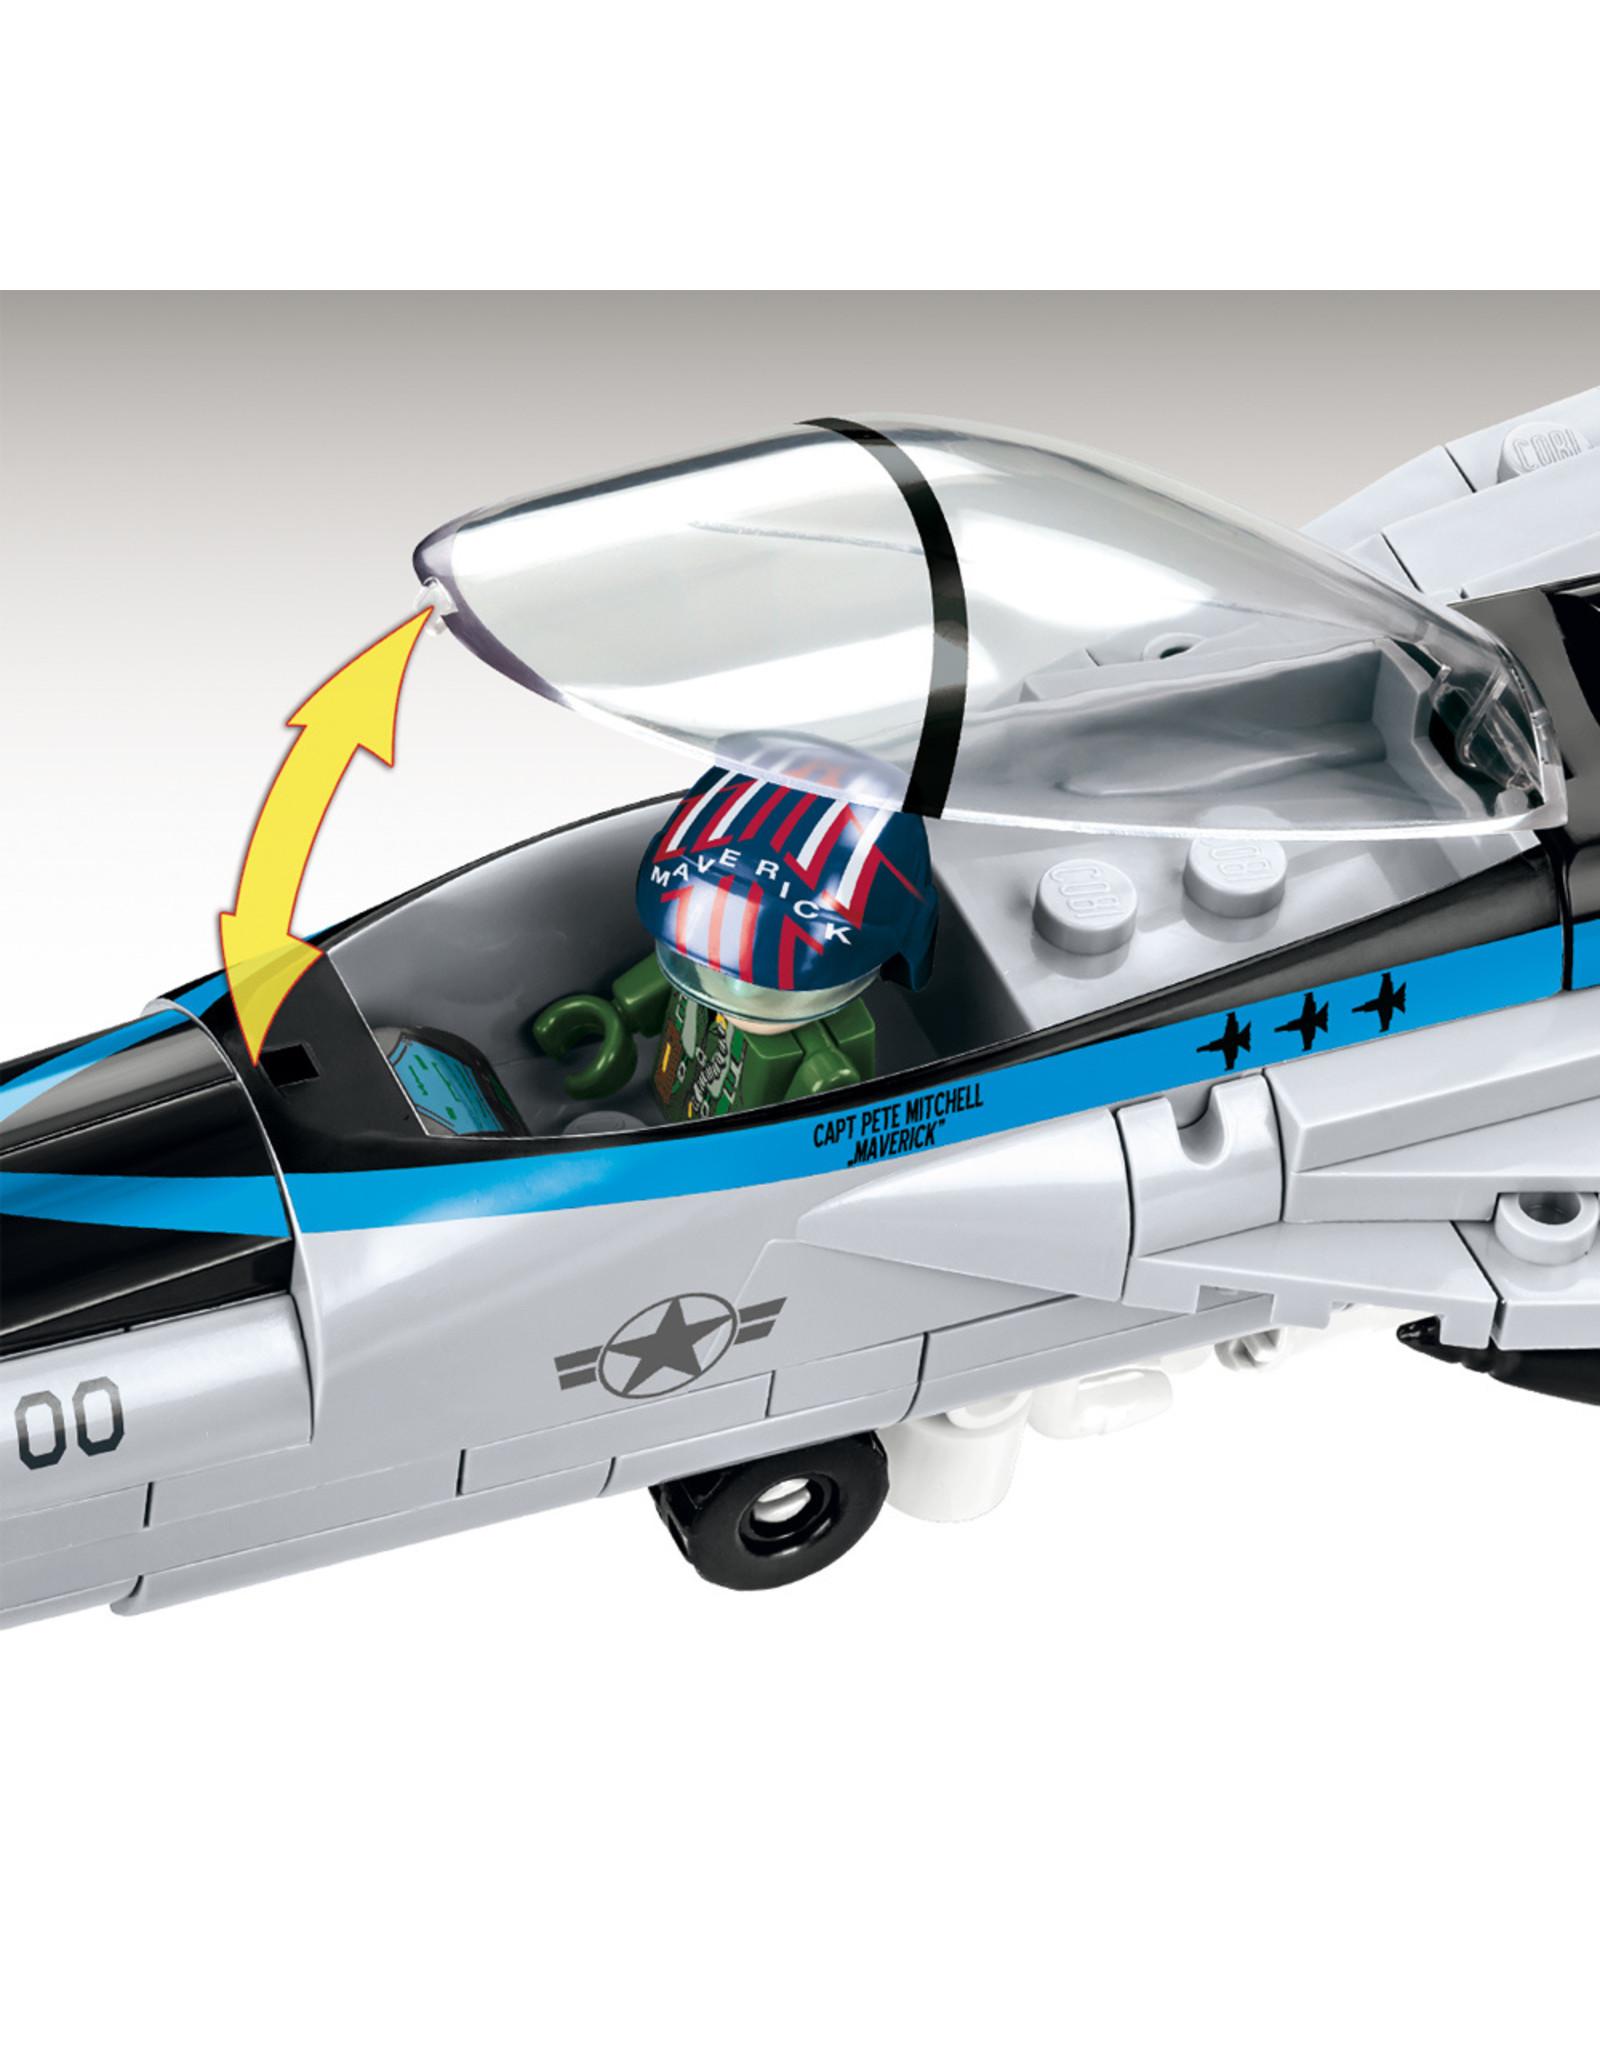 COBI COBI 5805 TOP GUN F/A-18E Super Hornet